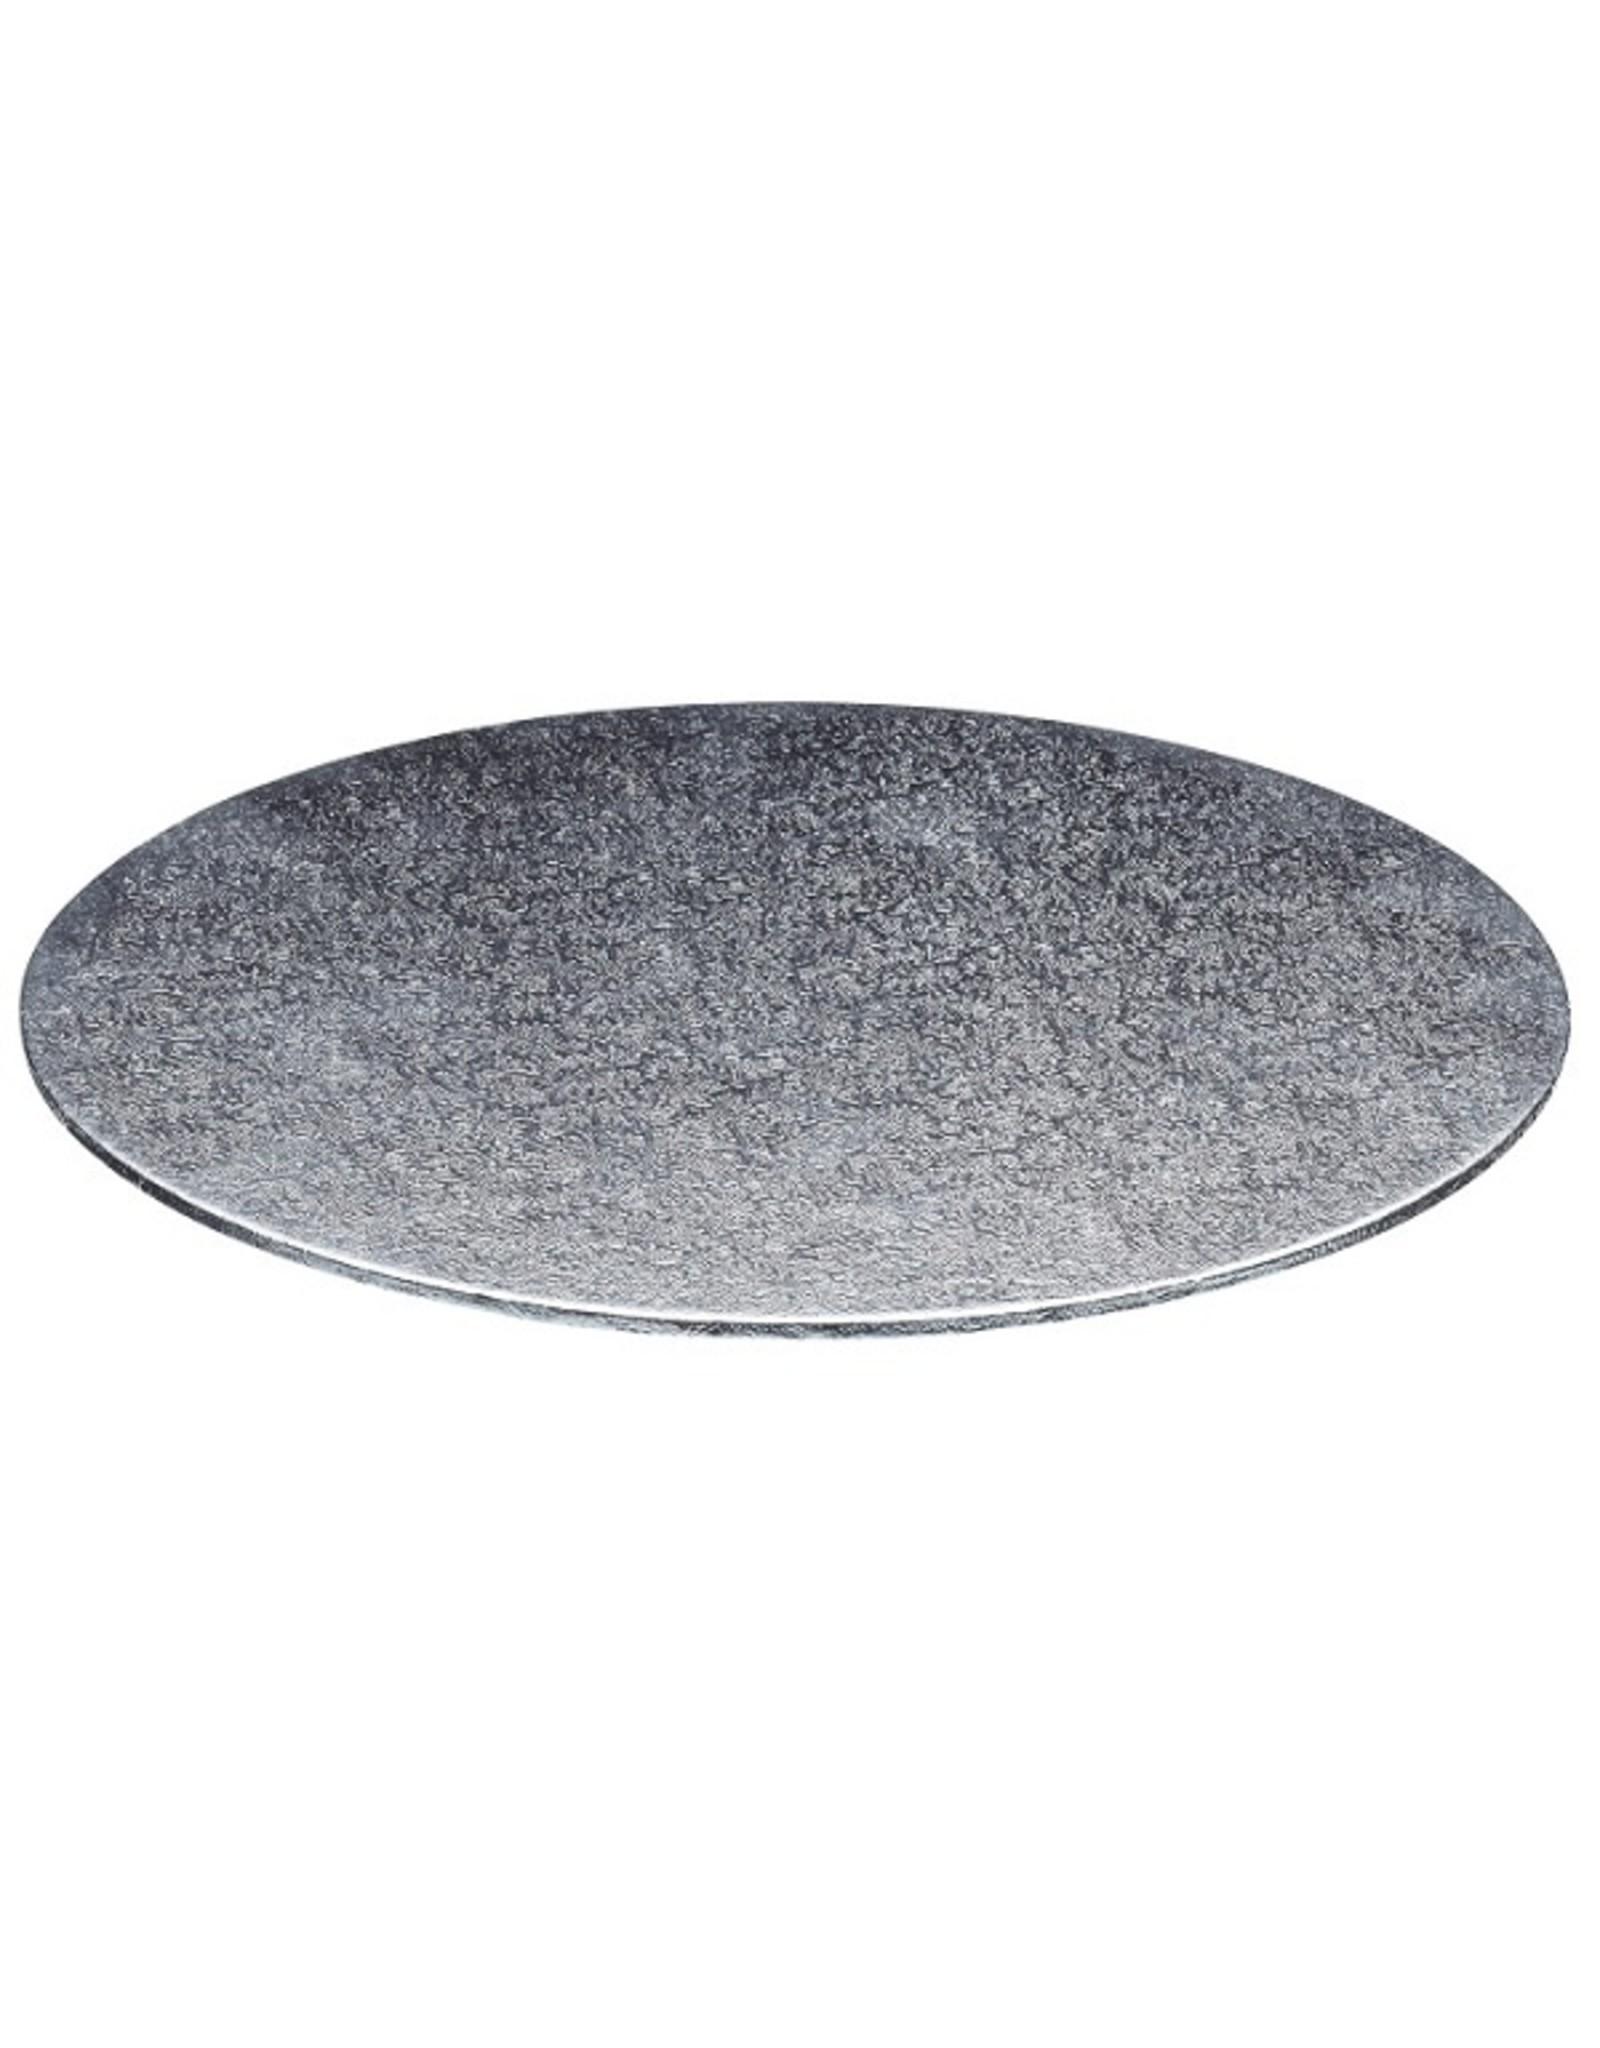 Cake boards Ø304 mm - silver (per 10 pieces)